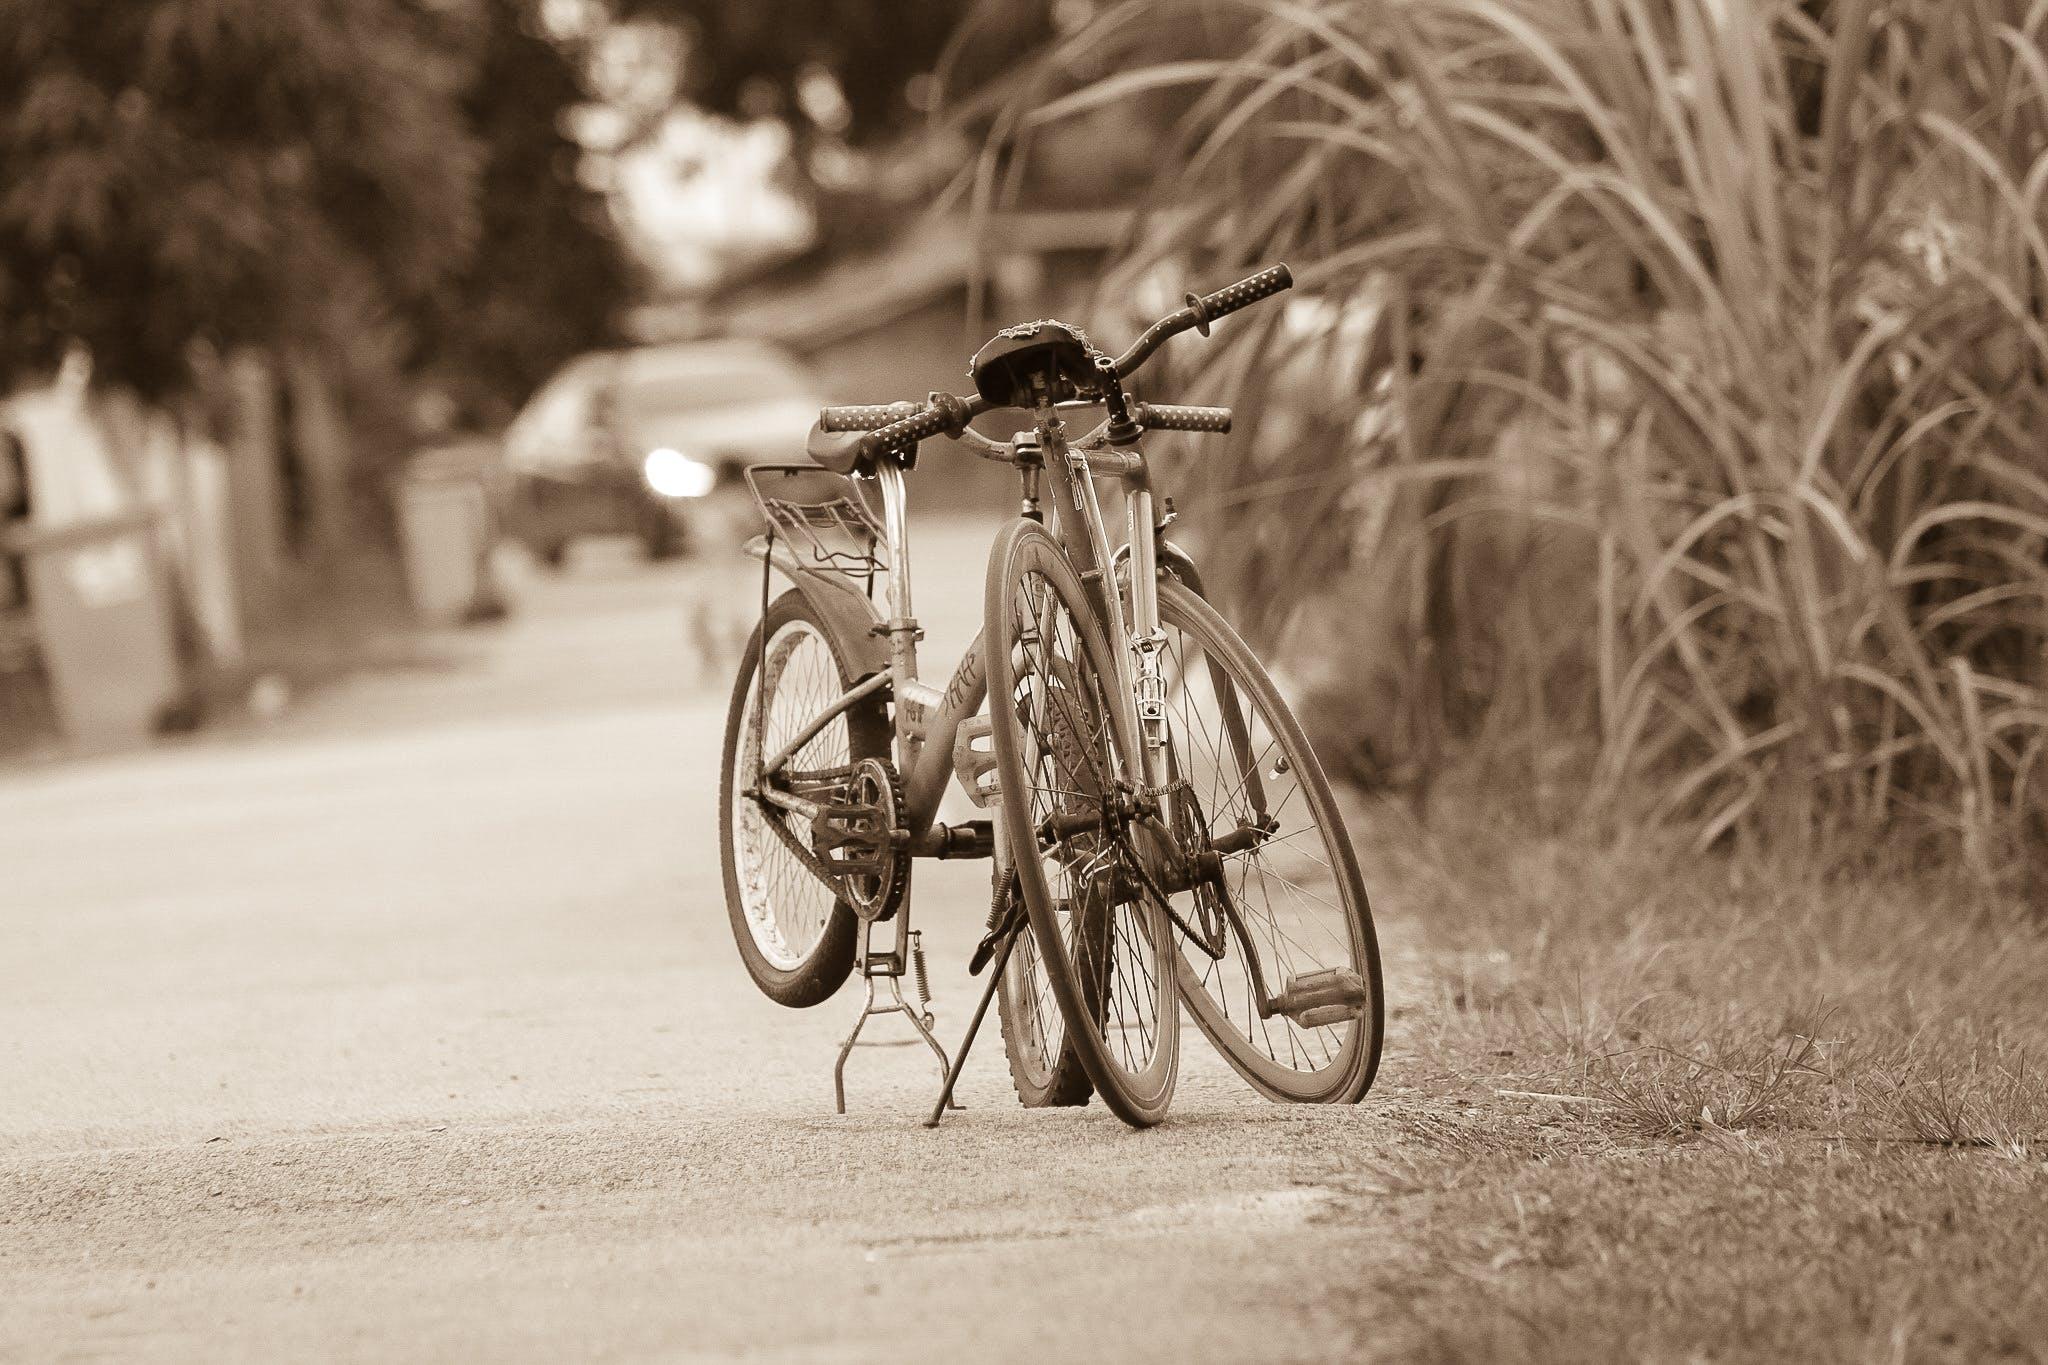 Grayscale Photo of Rigid Bikes